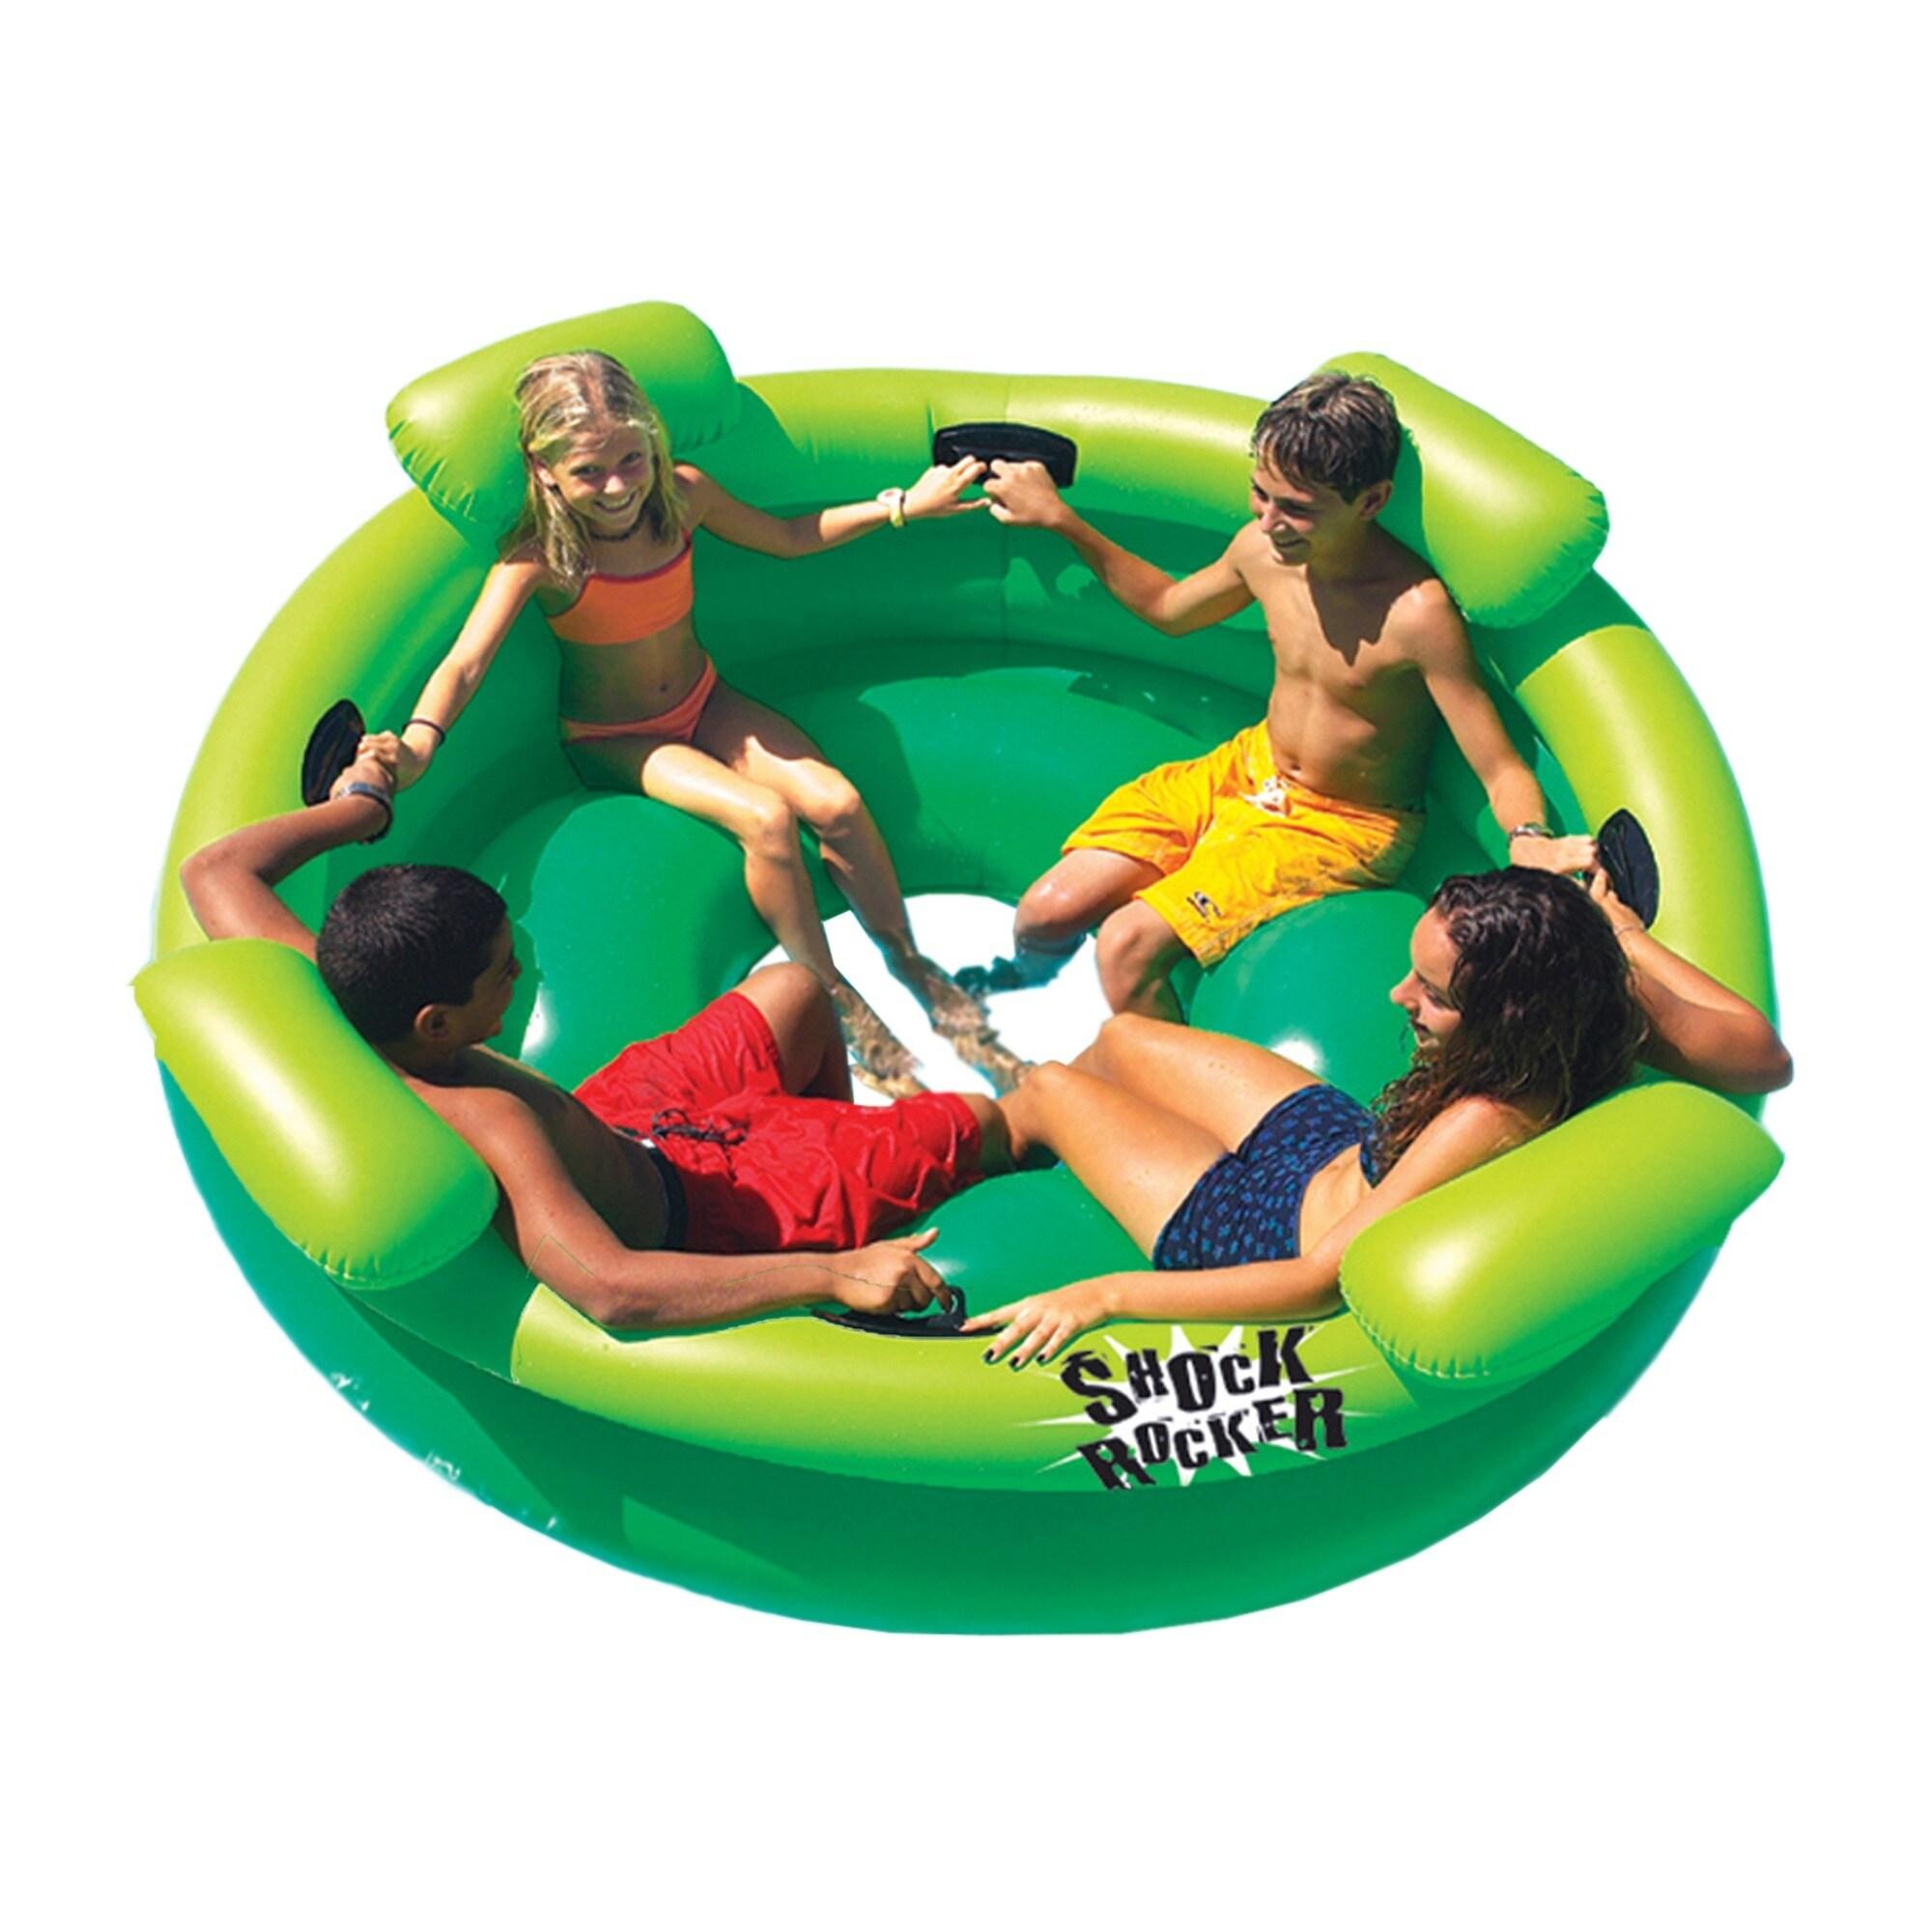 Swimline Galleon Raider Inflatable Pool Float-90945 - The